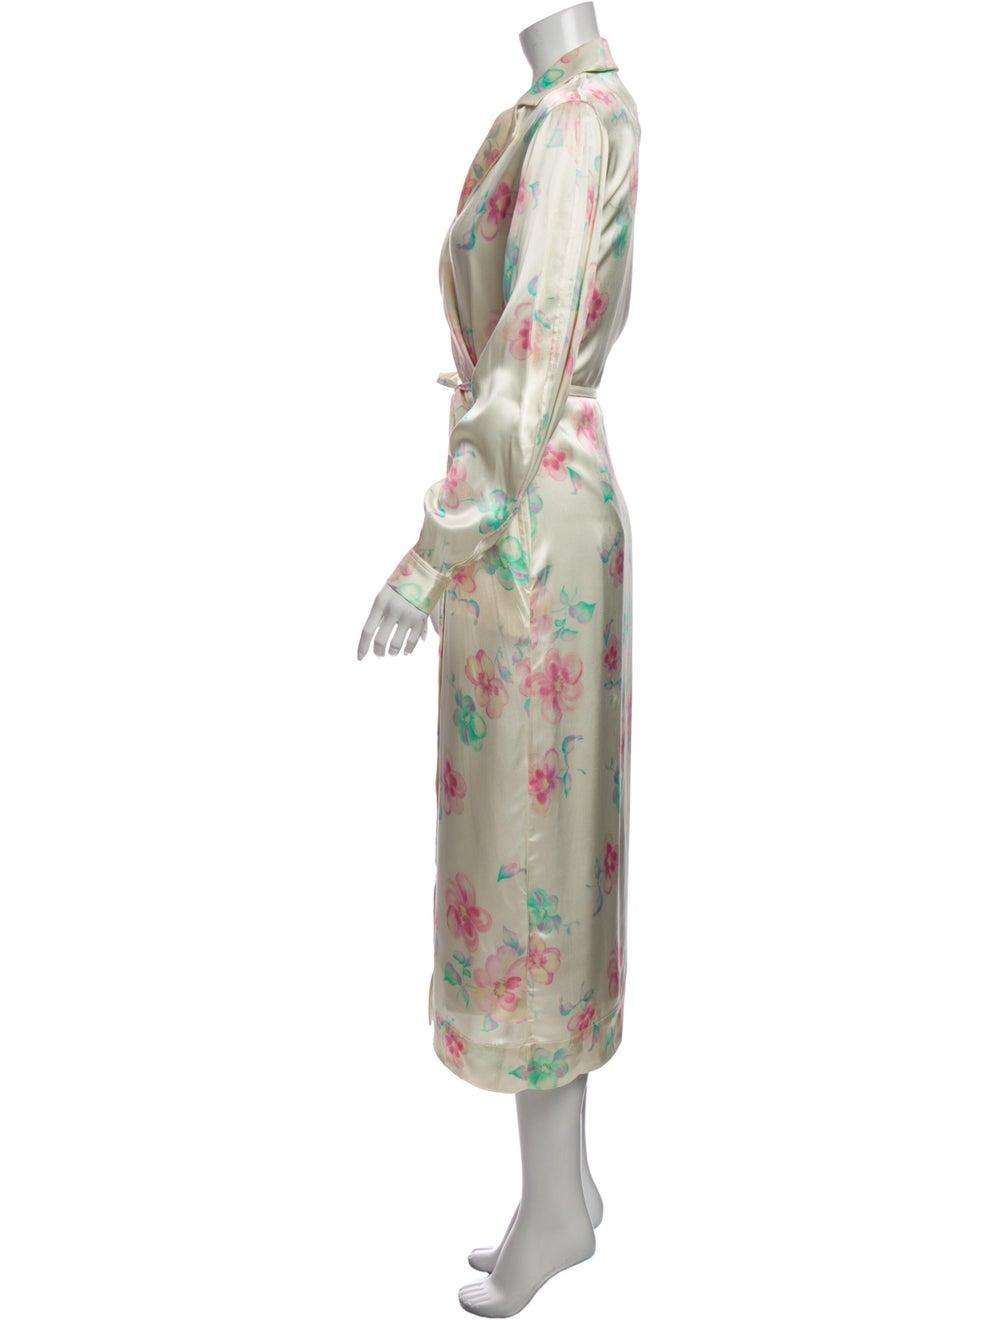 Ganni Floral Print Trench Coat - image 2